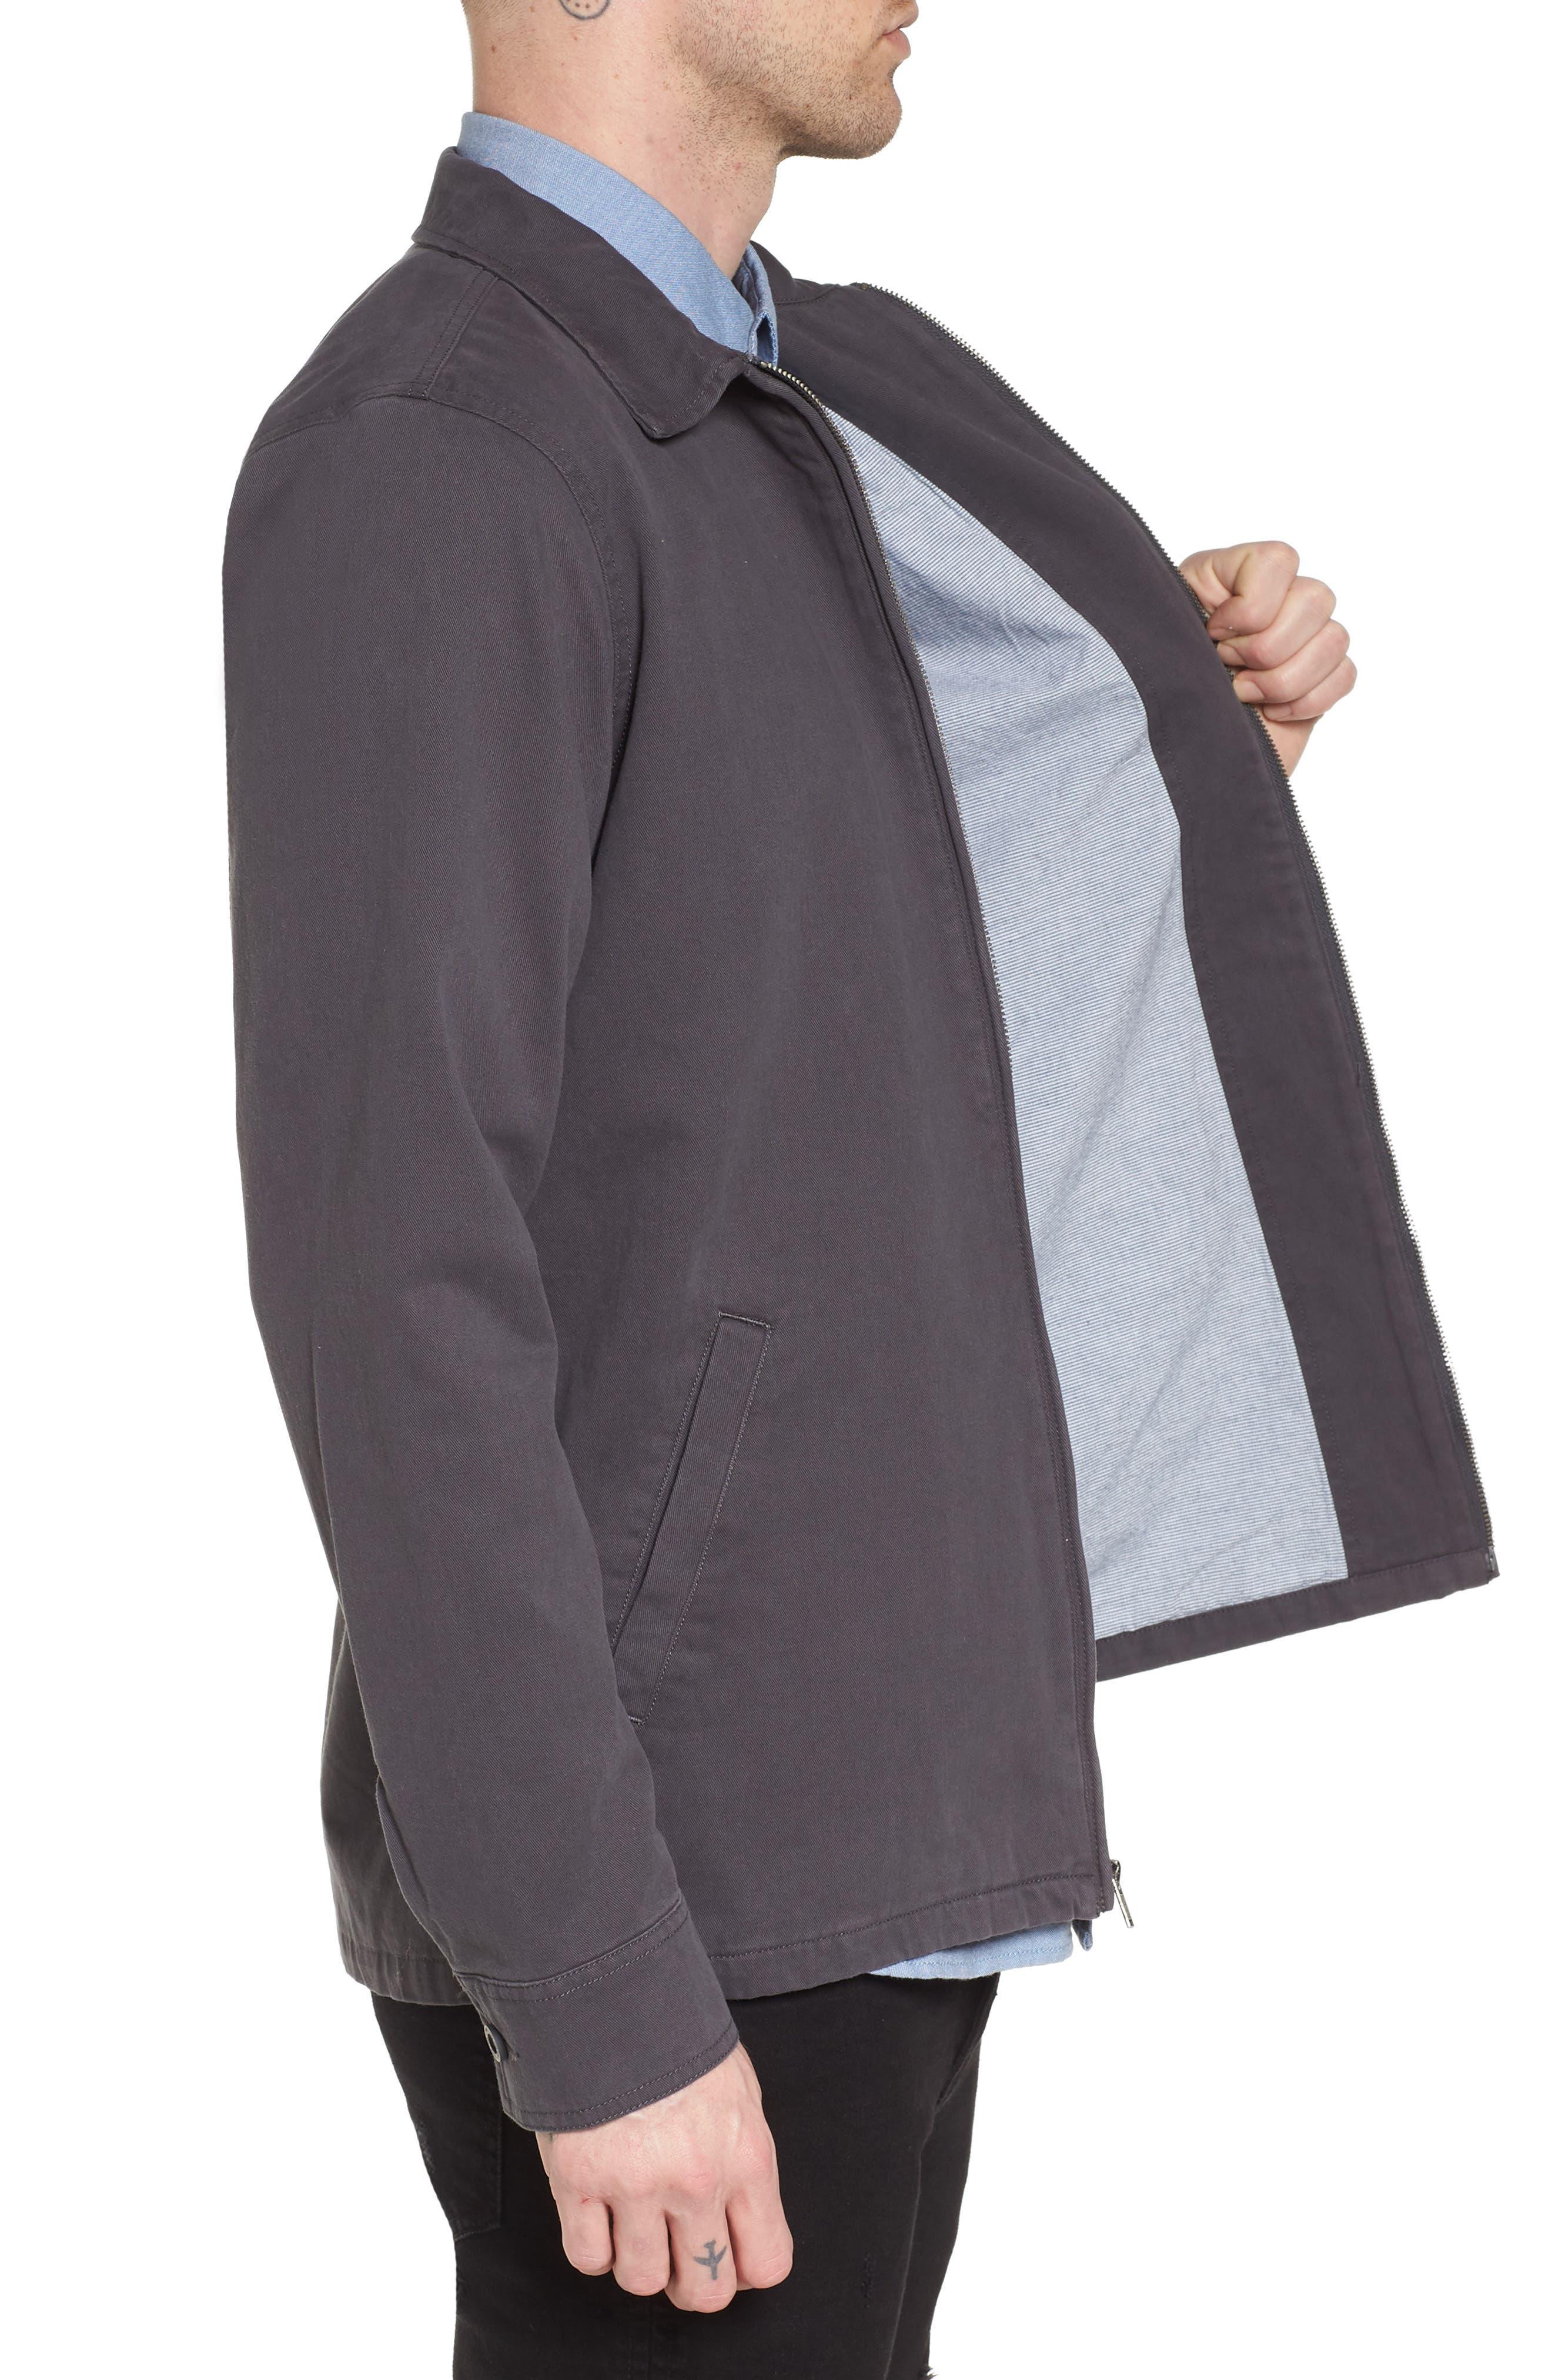 Belfair II Garage Jacket,                             Alternate thumbnail 3, color,                             Asphalt